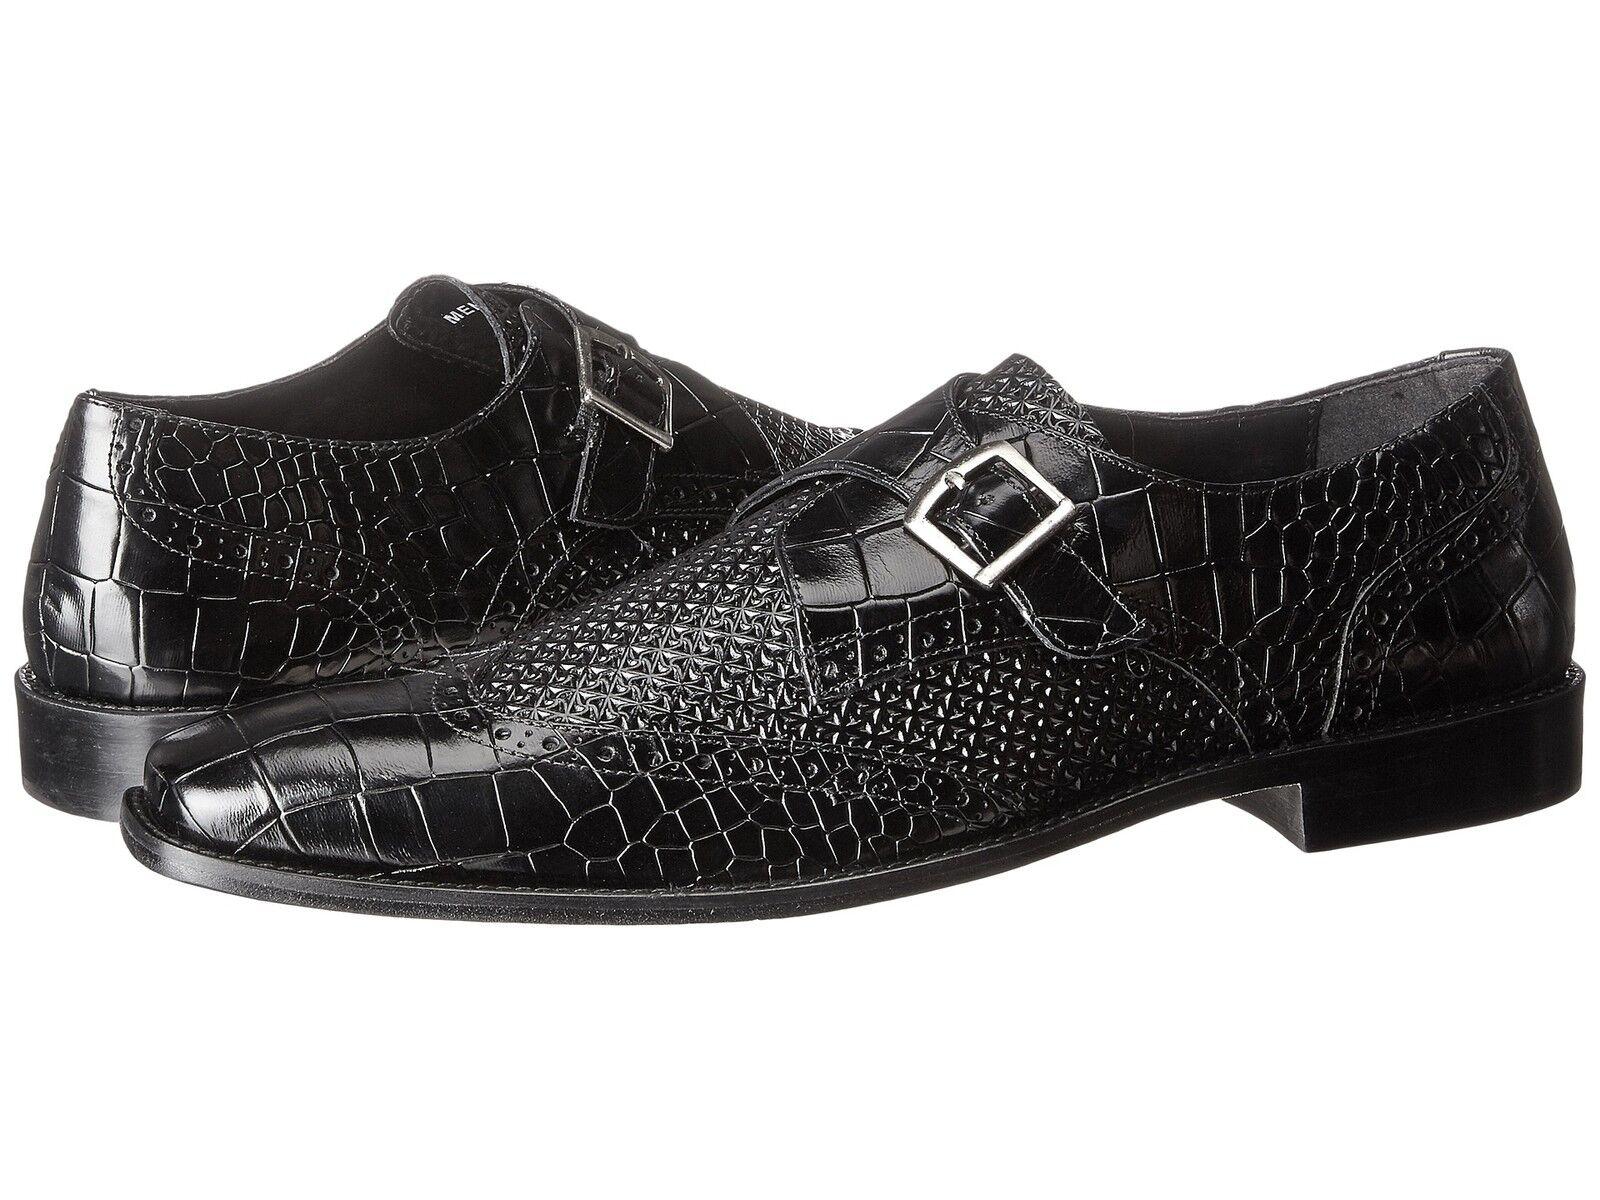 Stacy Adams Para Hombre Monje Correa de extremo de ala Cuero Negro Giannino Zapatos 25084-001